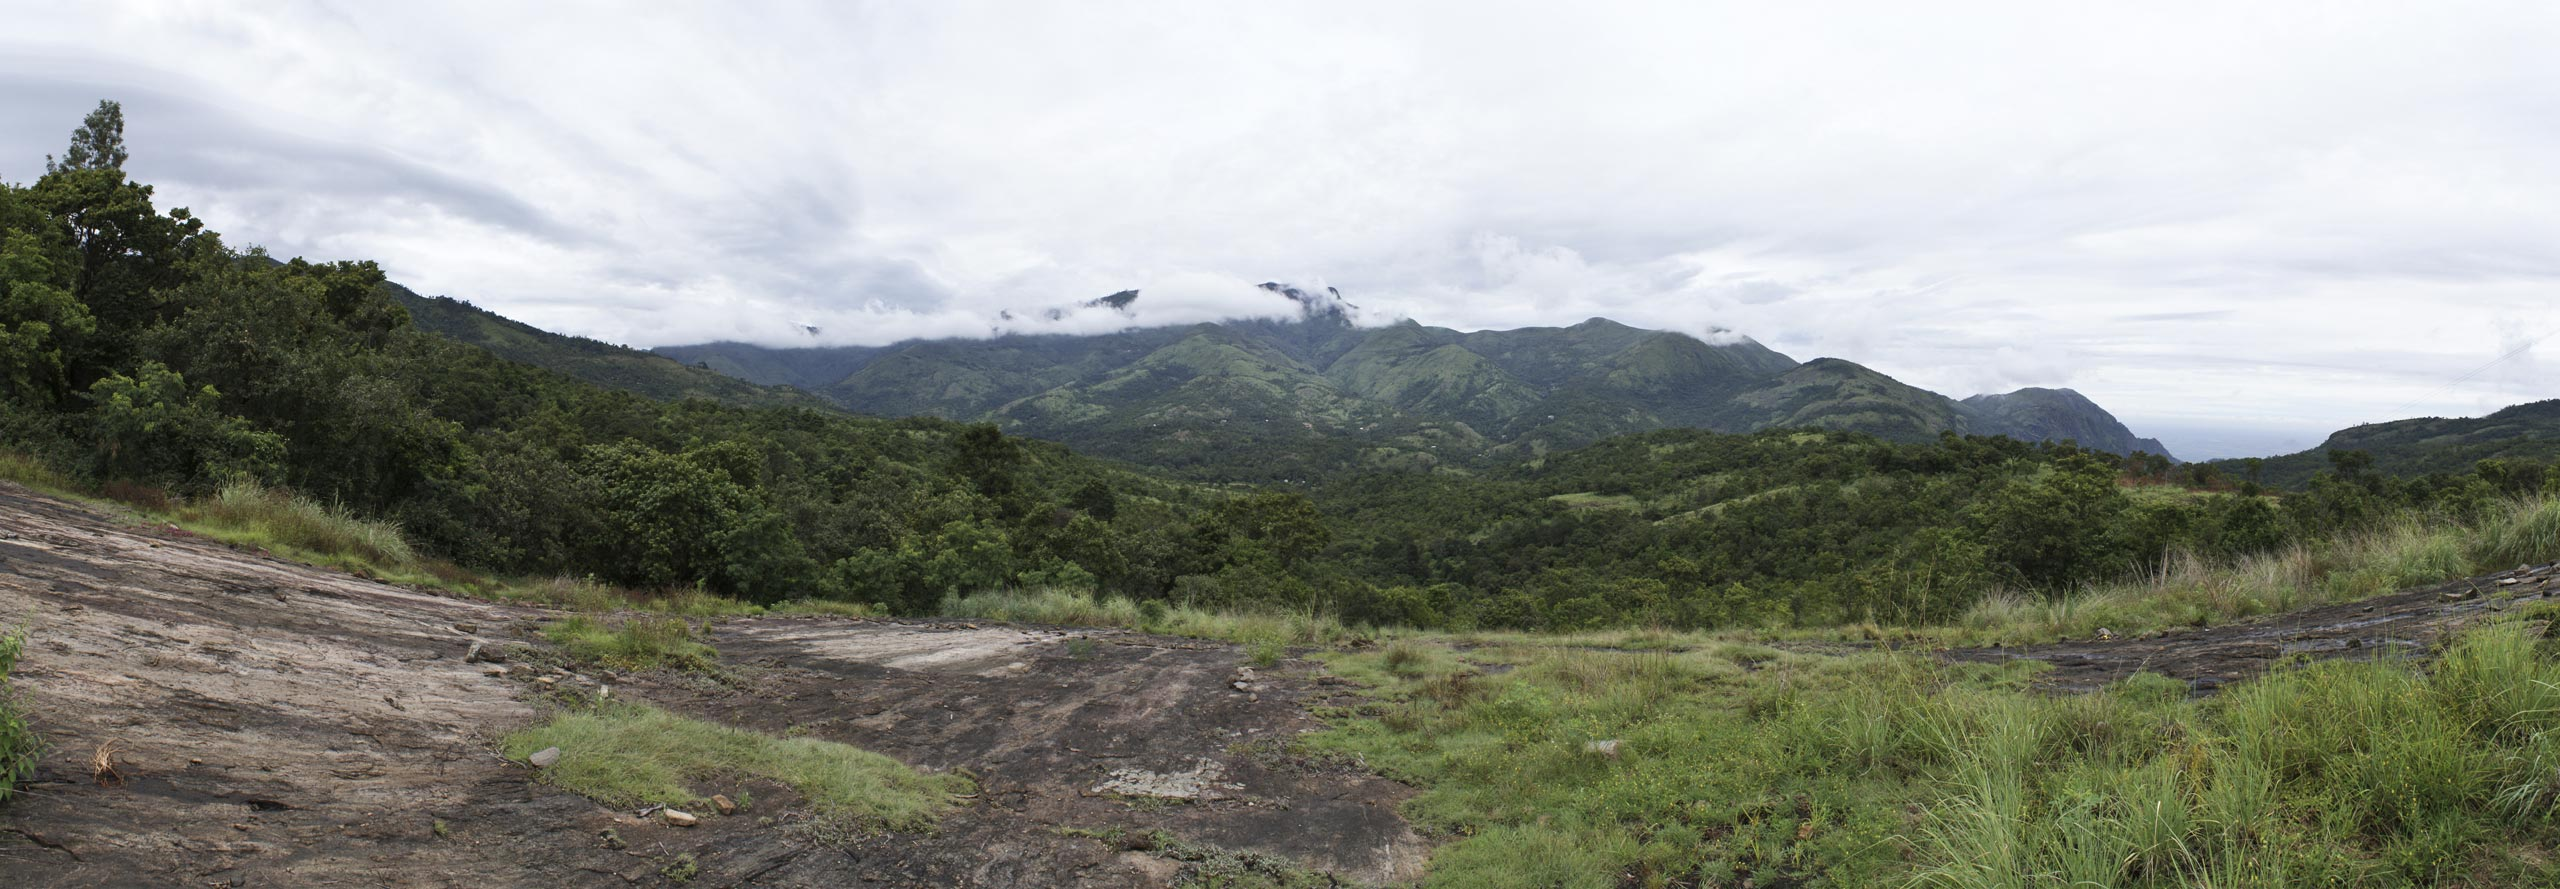 Forest Home Temenos Landscape